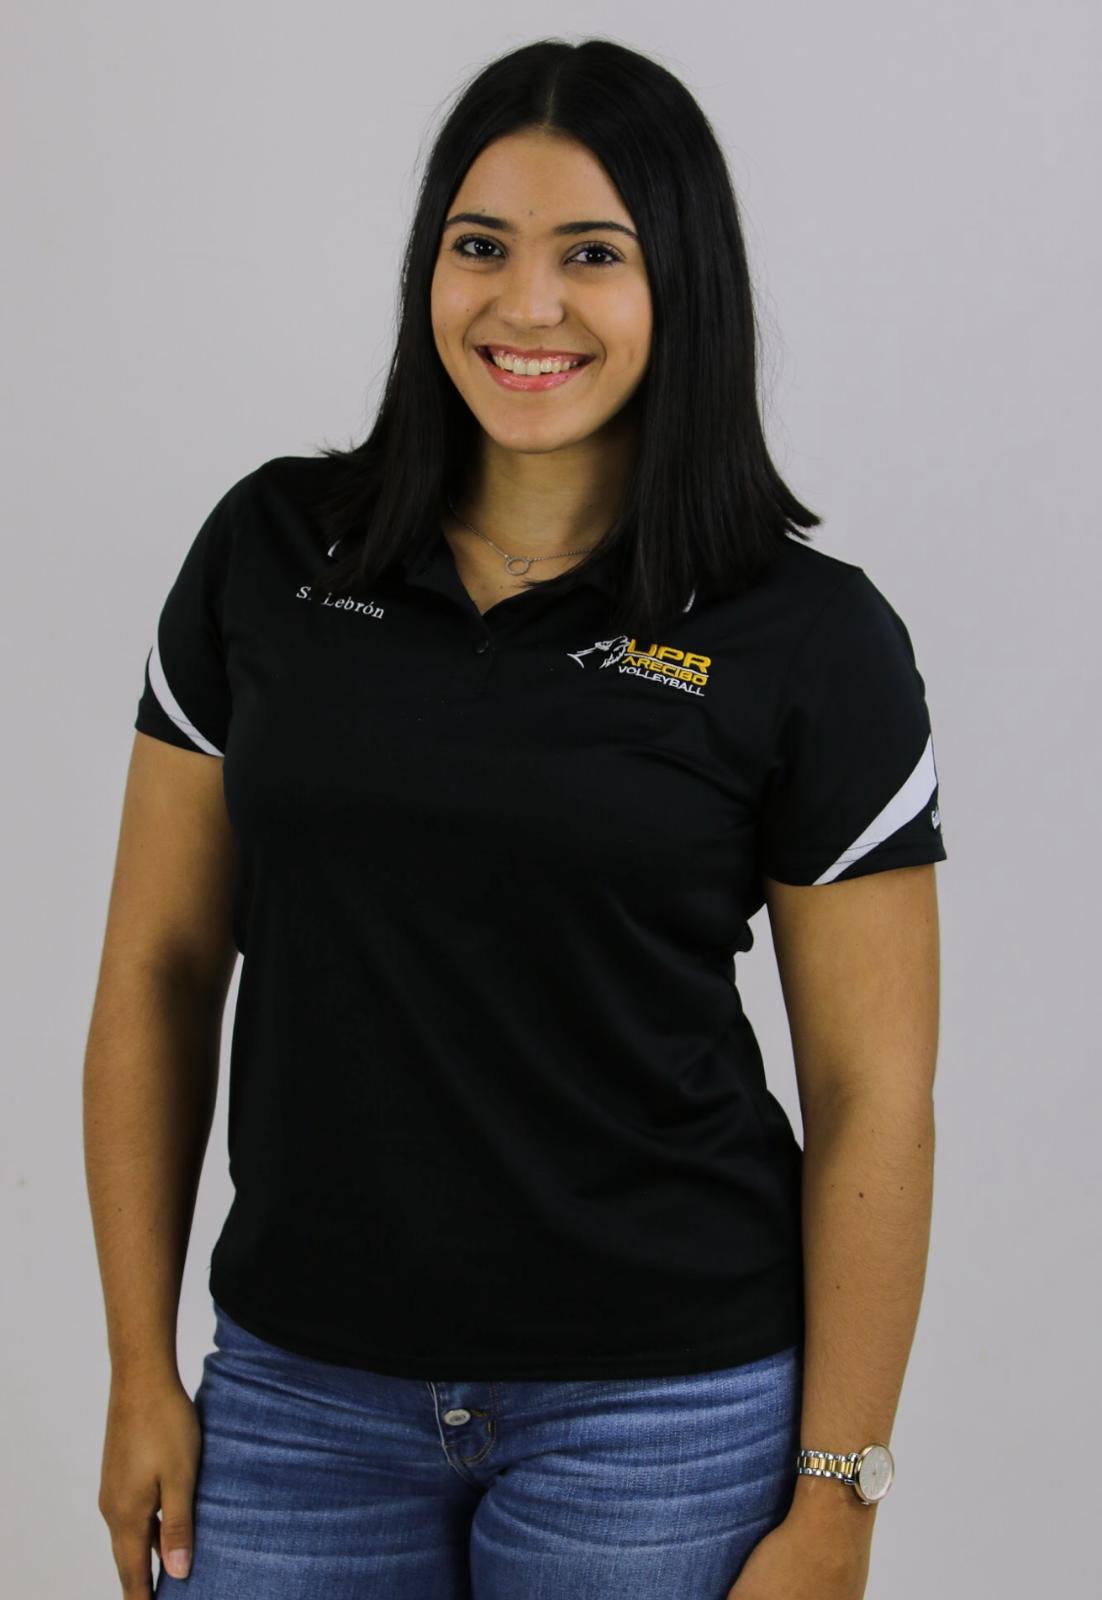 Sabrina Nicole Lebrón